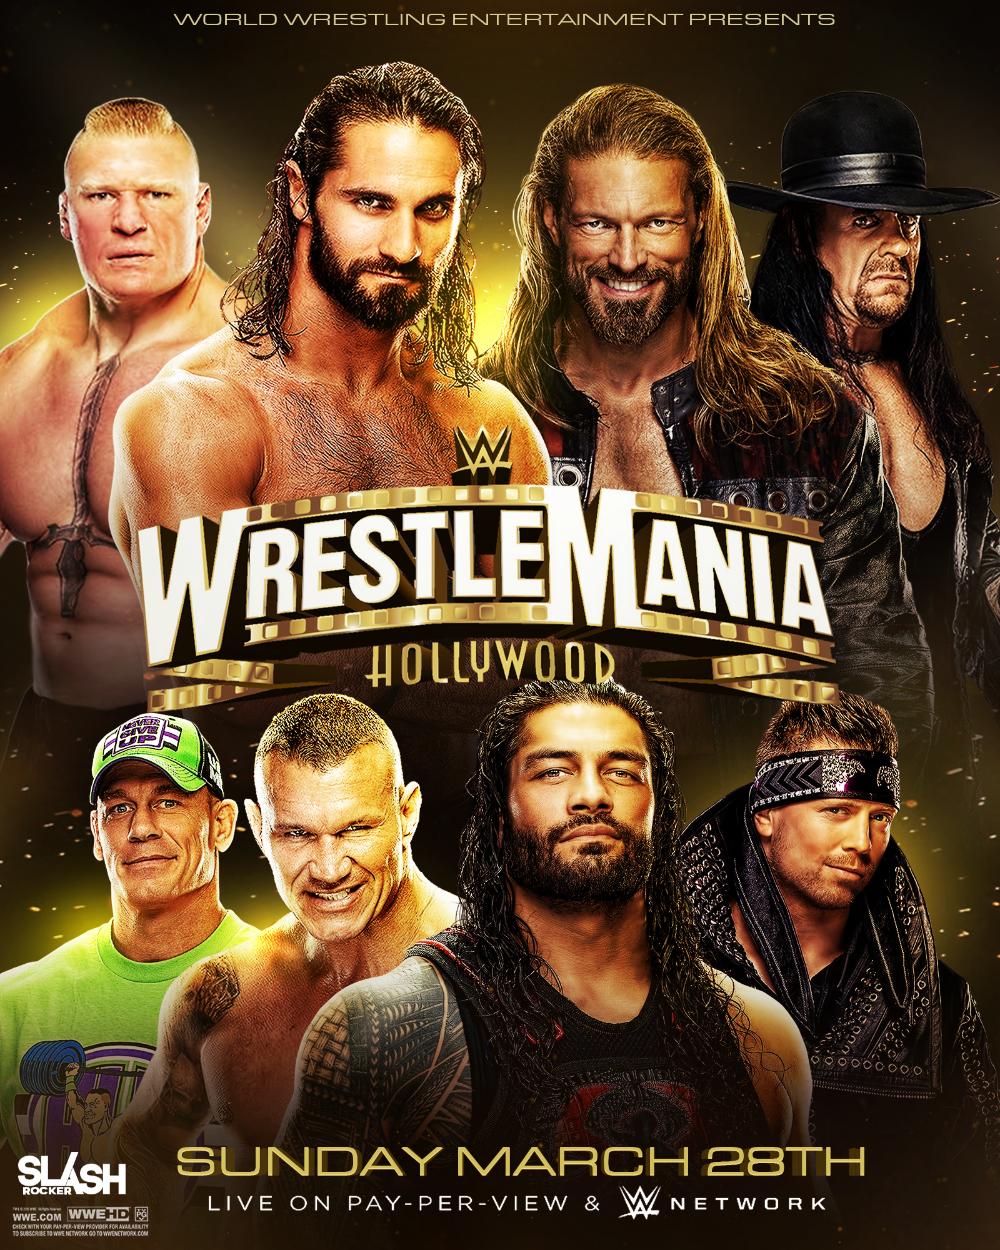 Wwe Wrestlemania 37 Poster By Wweslashrocker54 On Deviantart Wwe Wrestling Wwe Wrestlemania